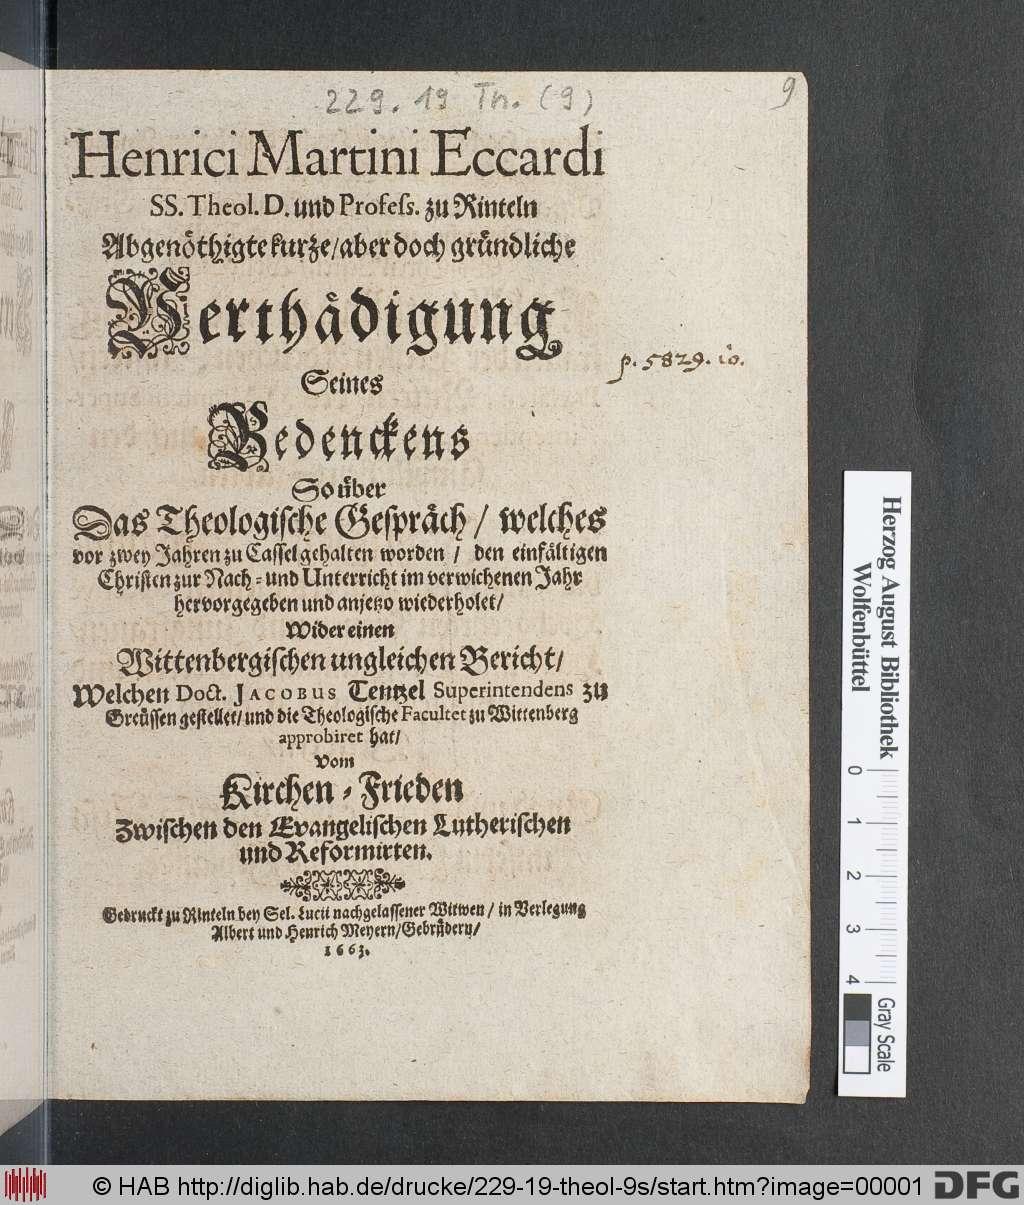 https://diglib.hab.de/drucke/229-19-theol-9s/00001.jpg